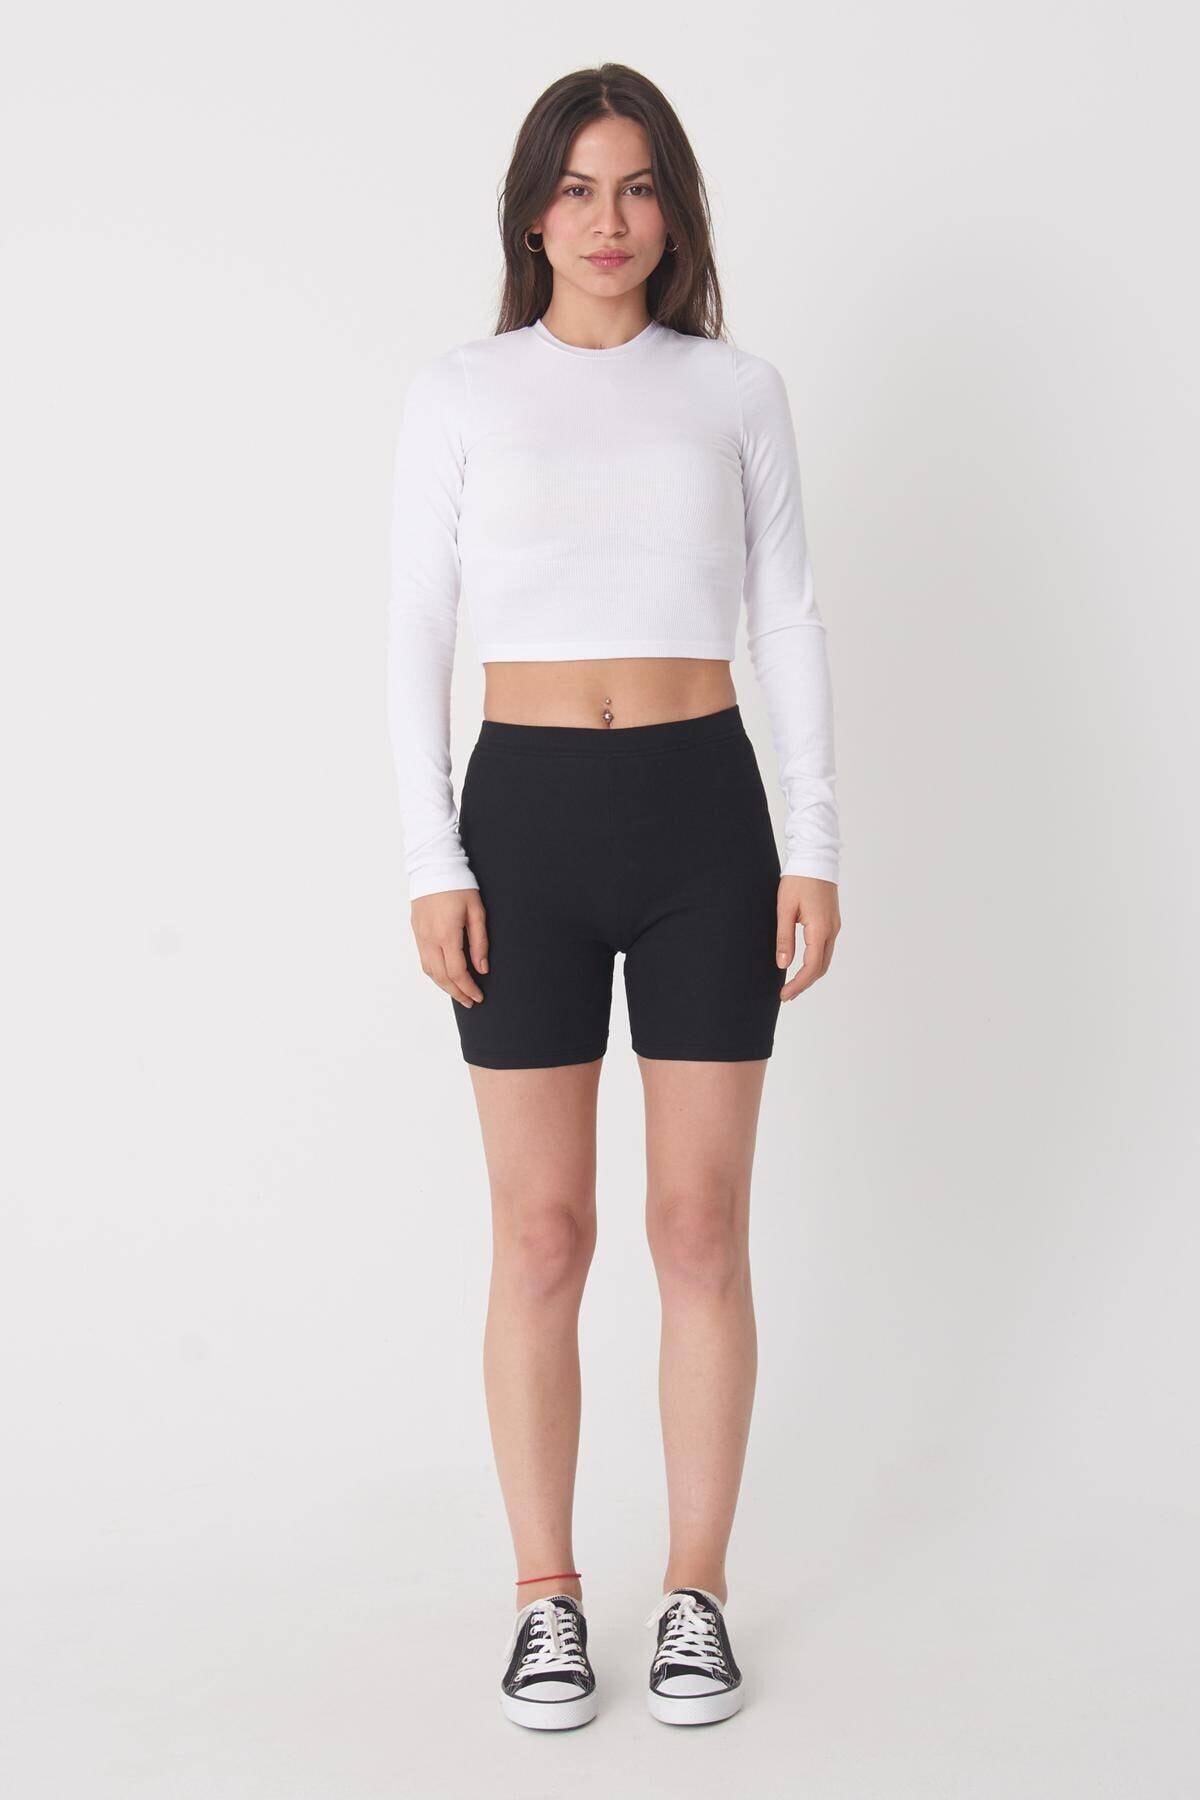 Addax Kadın Beyaz Uzun Kollu Bluz P1017 - K12 ADX-0000022662 2